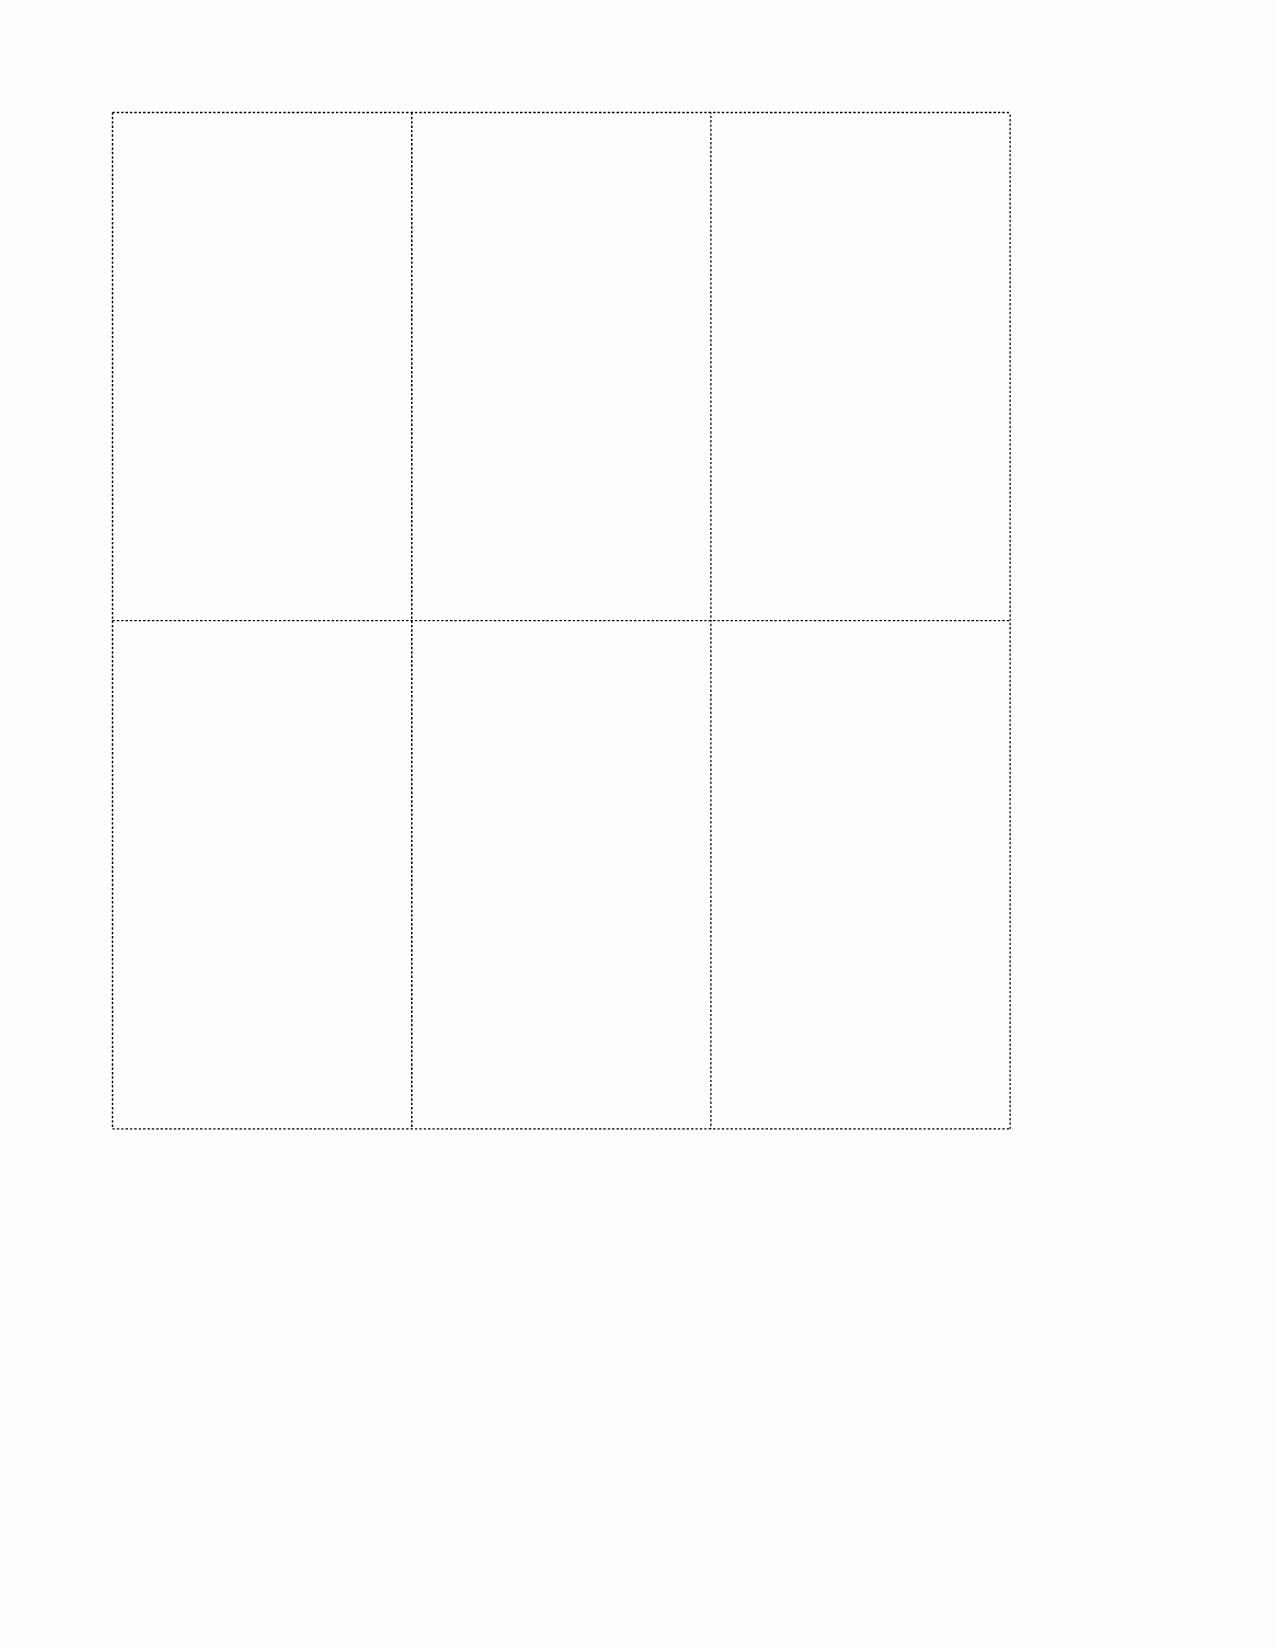 Microsoft Word Playing Card Template Elegant 13 Playing Card Design Template Printable Blank